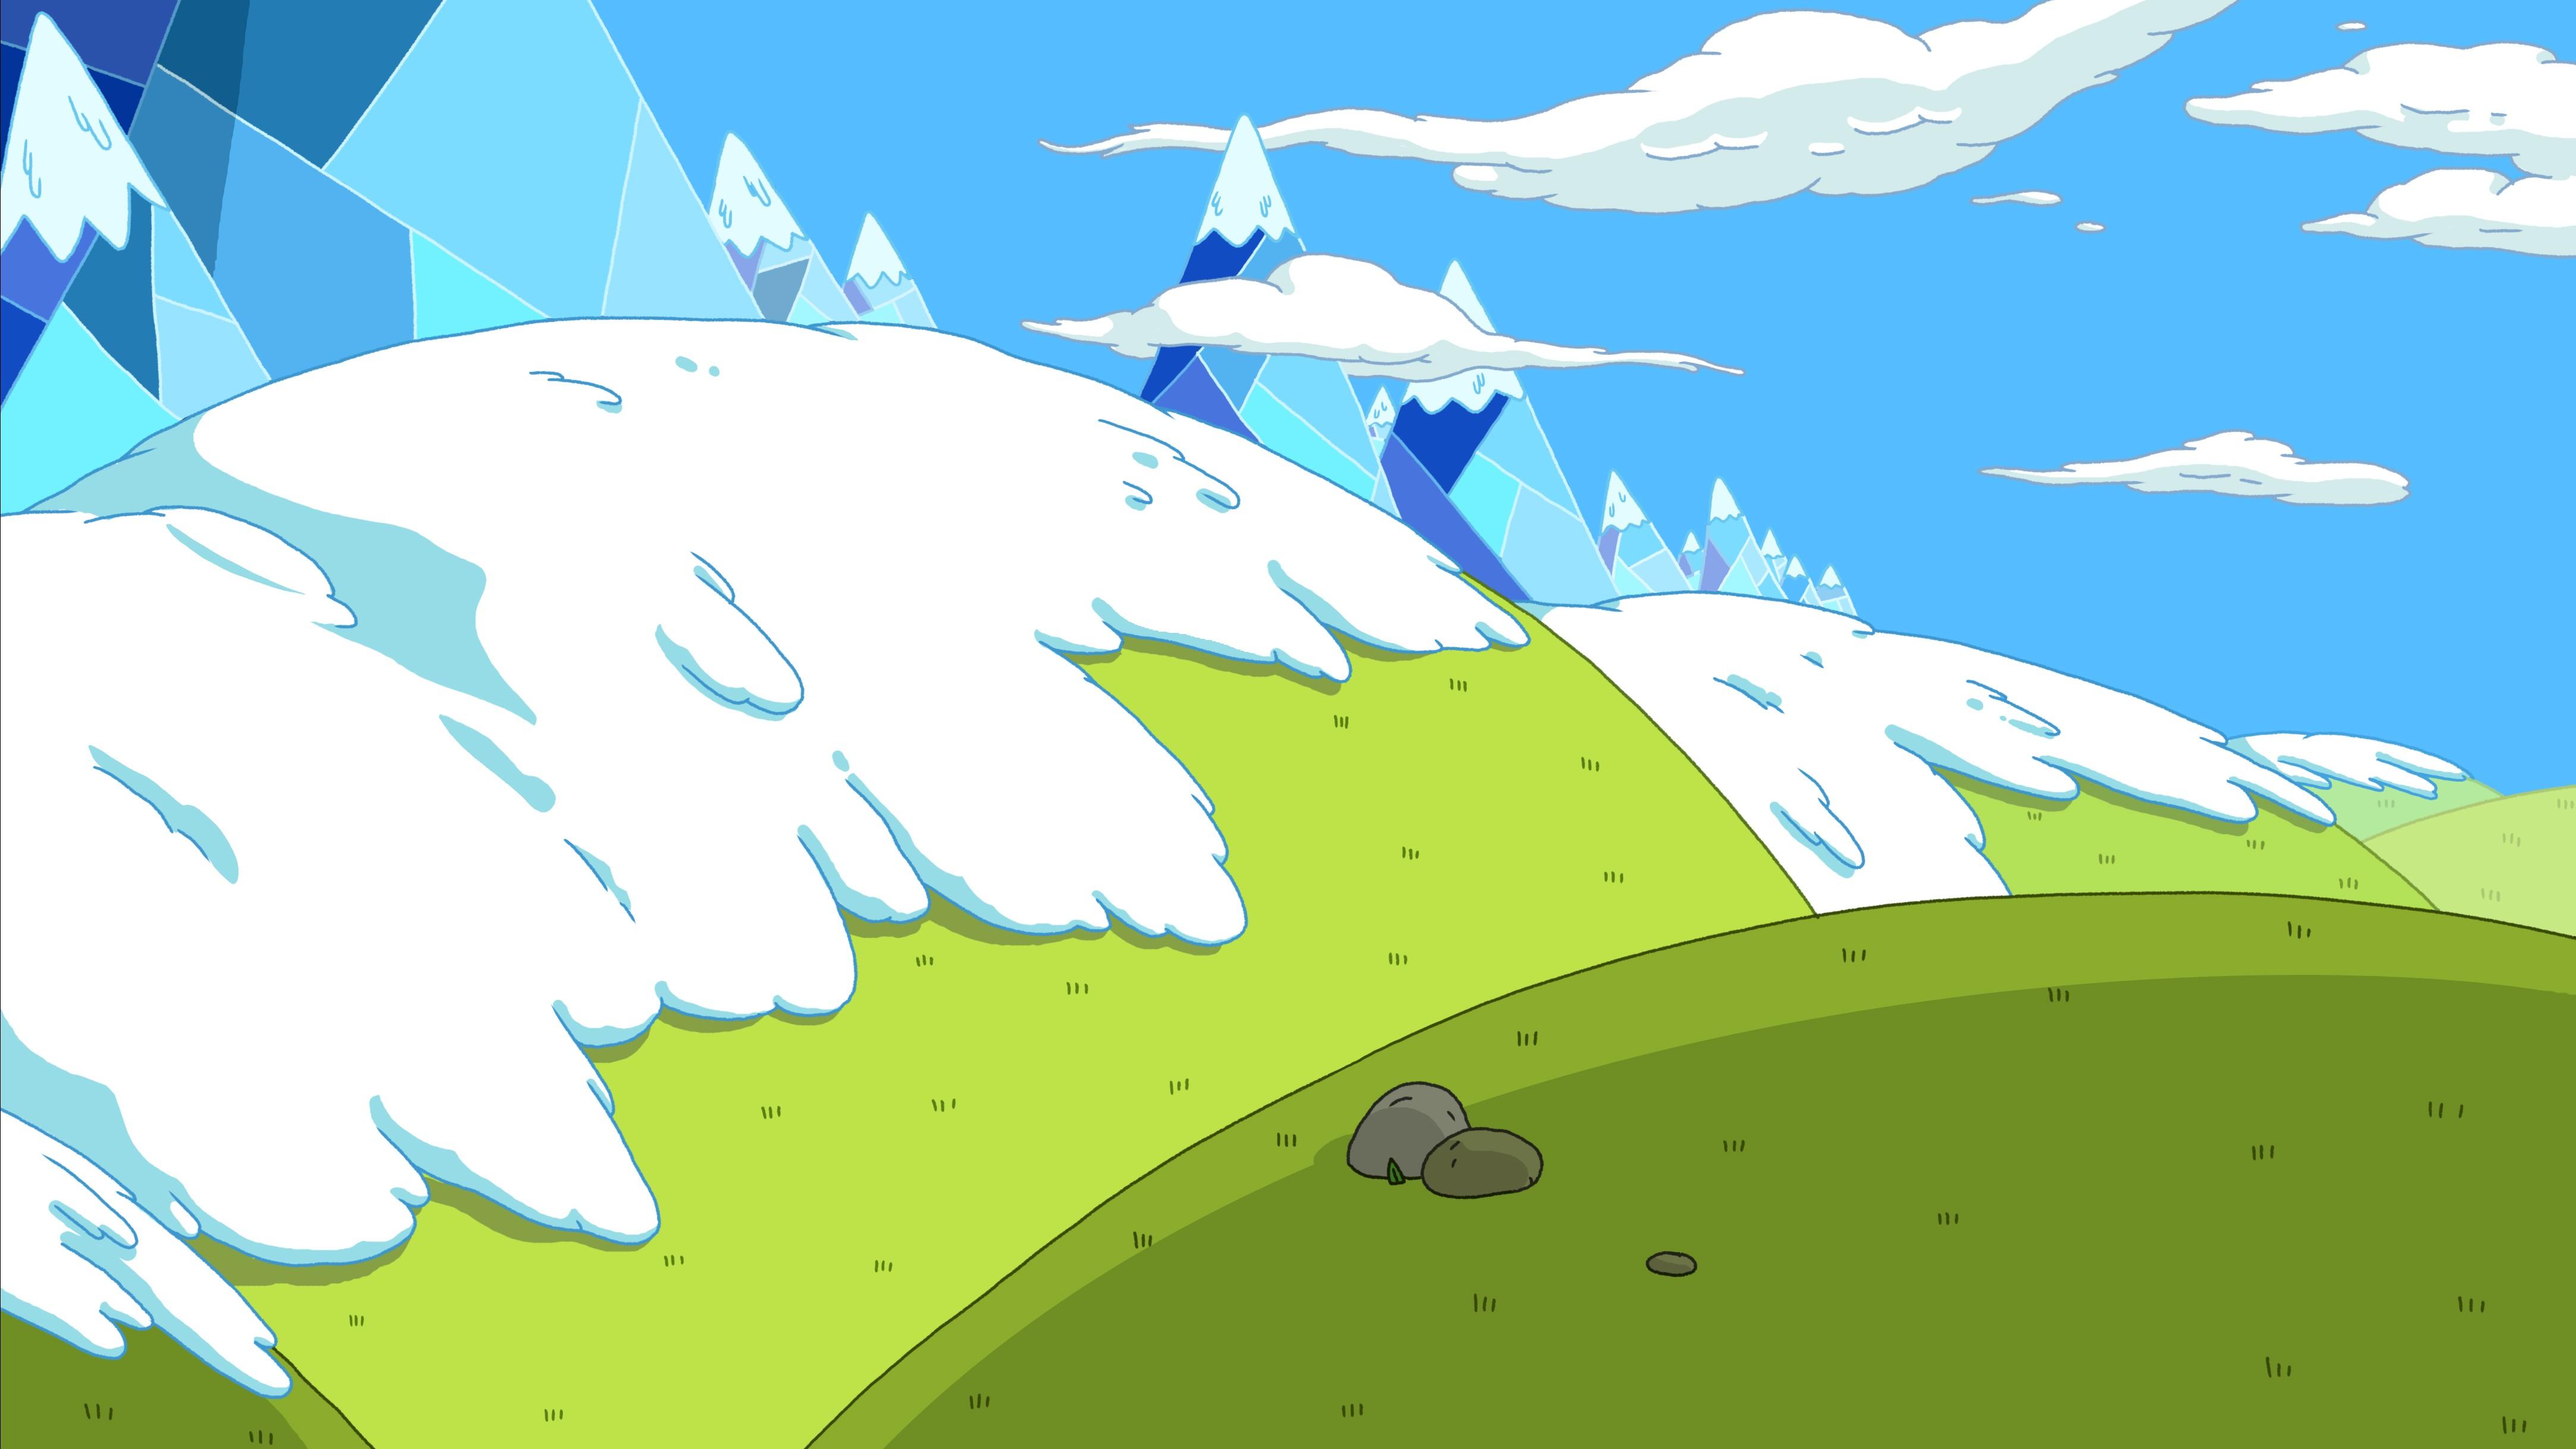 Unduh 410 Background Animasi Kartun HD Terbaru